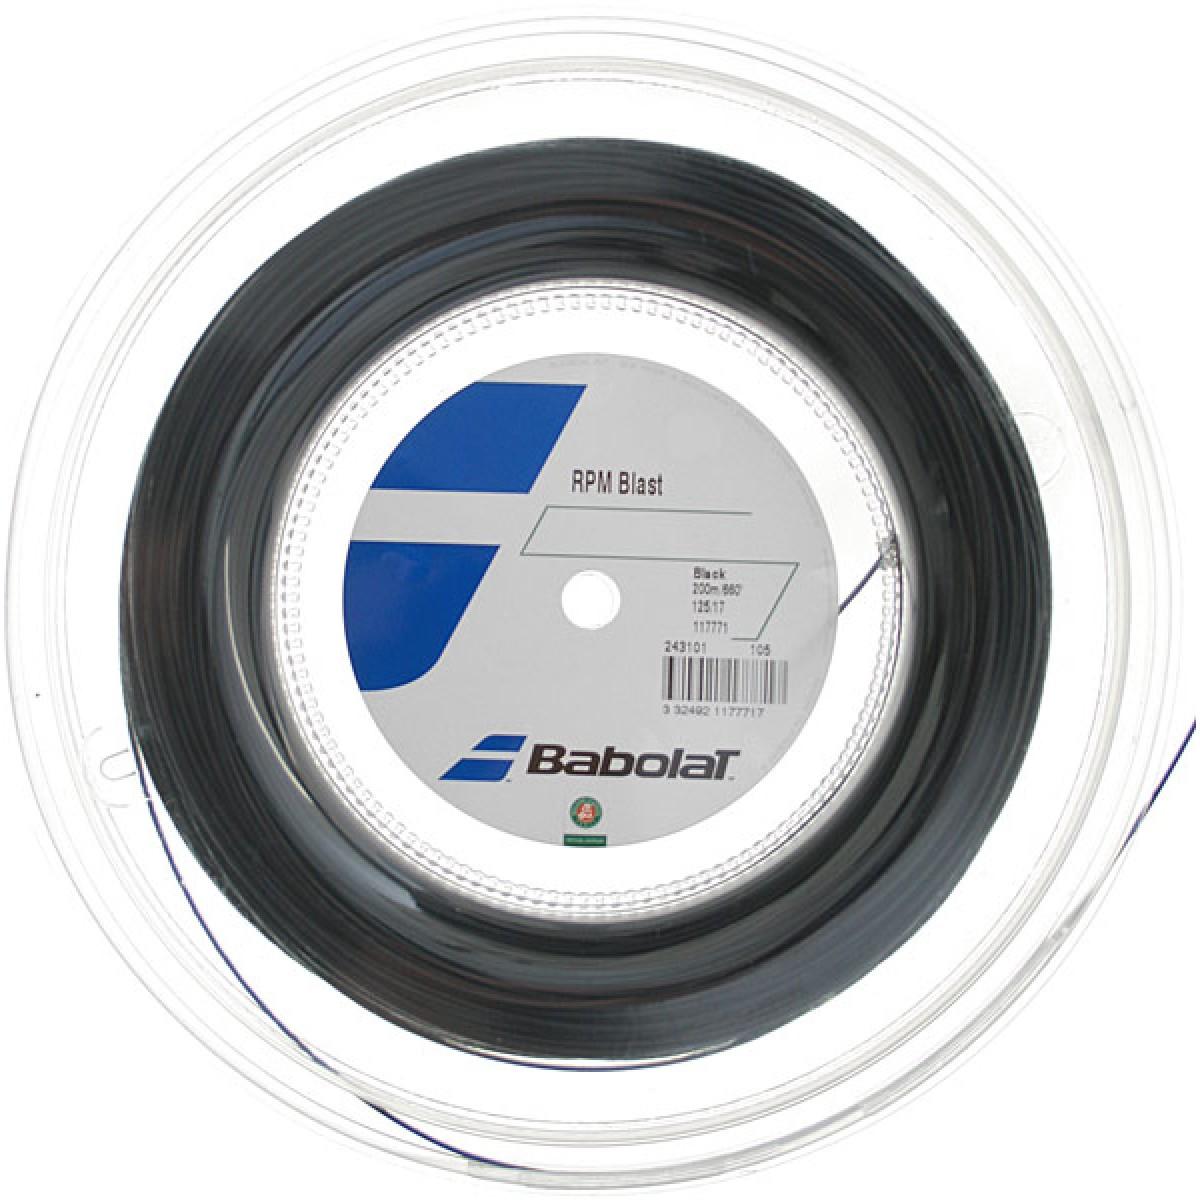 BOBINE BABOLAT RPM BLAST (200 METRES)